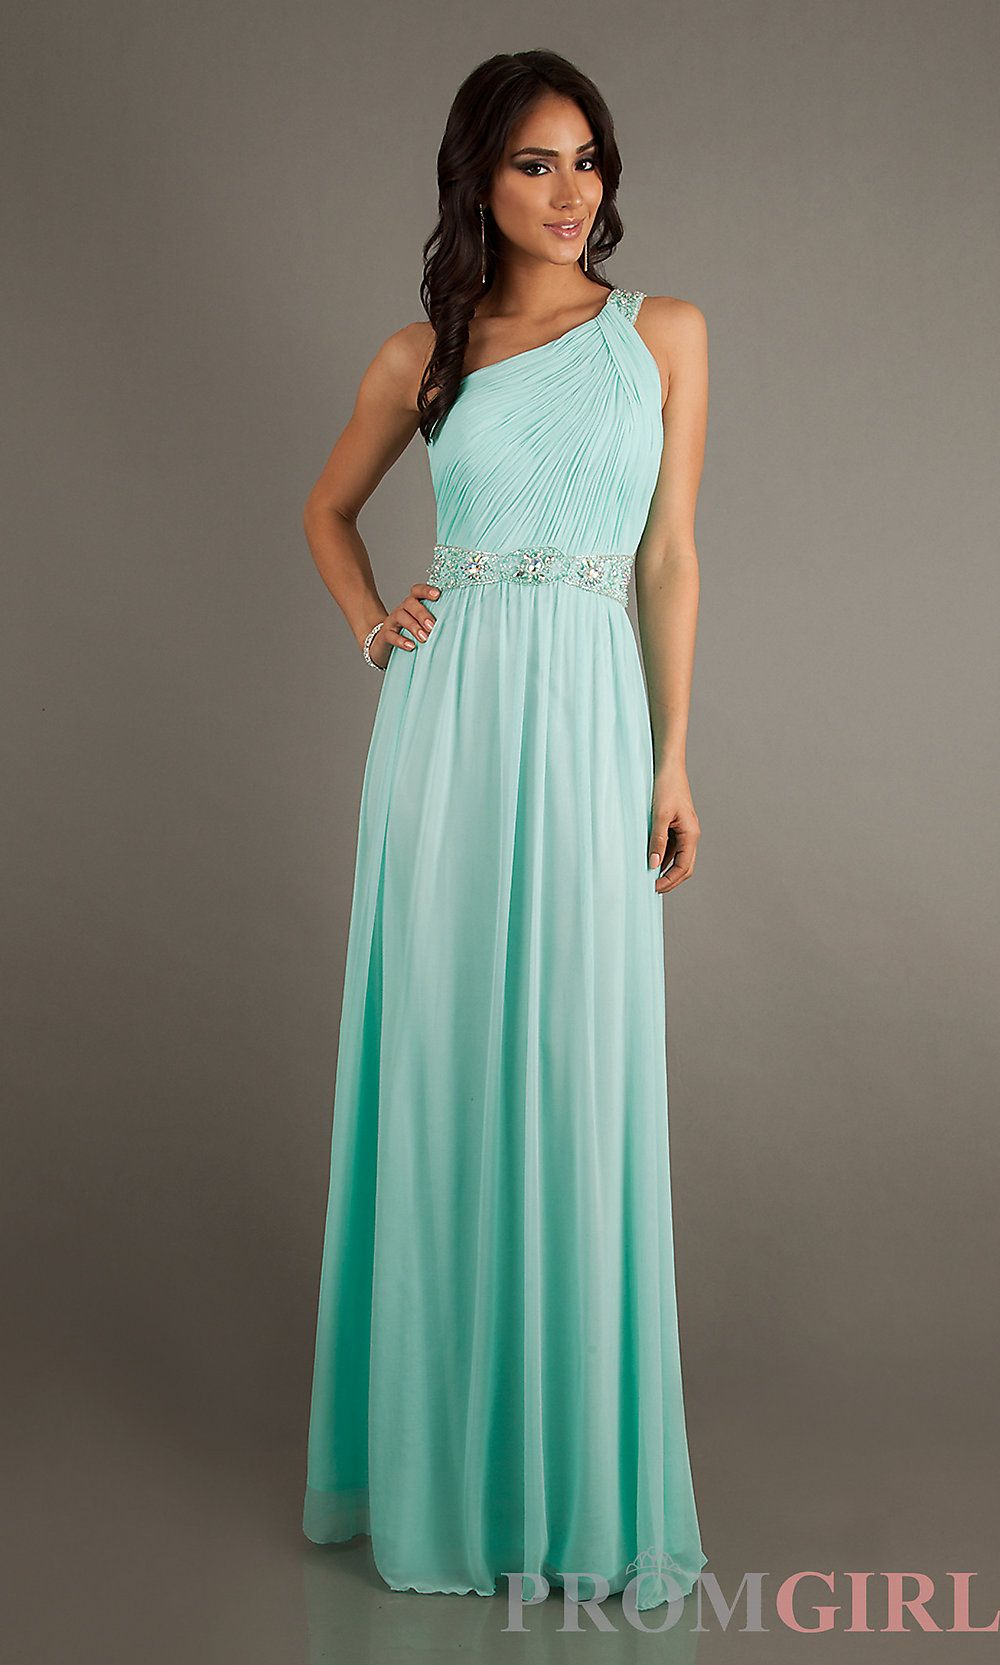 2013 Temptation Prom Dress, One Shoulder Evening Gowns